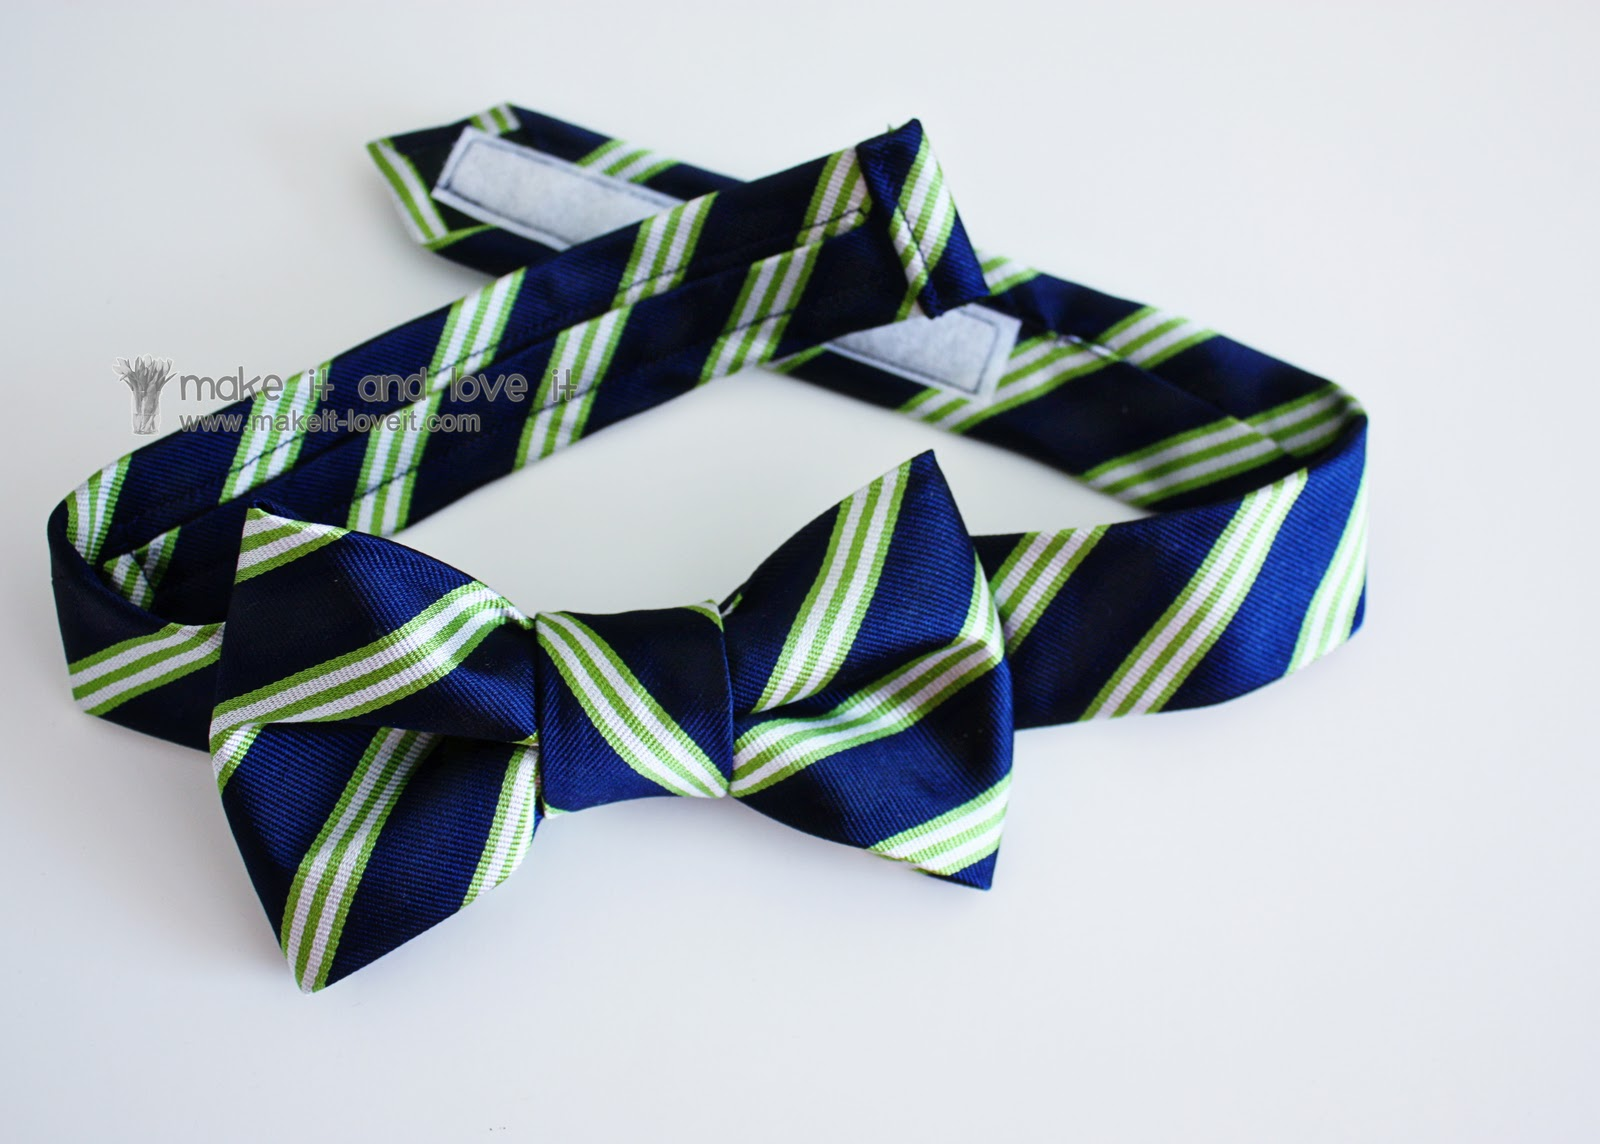 bow tie stores near me photo - 1